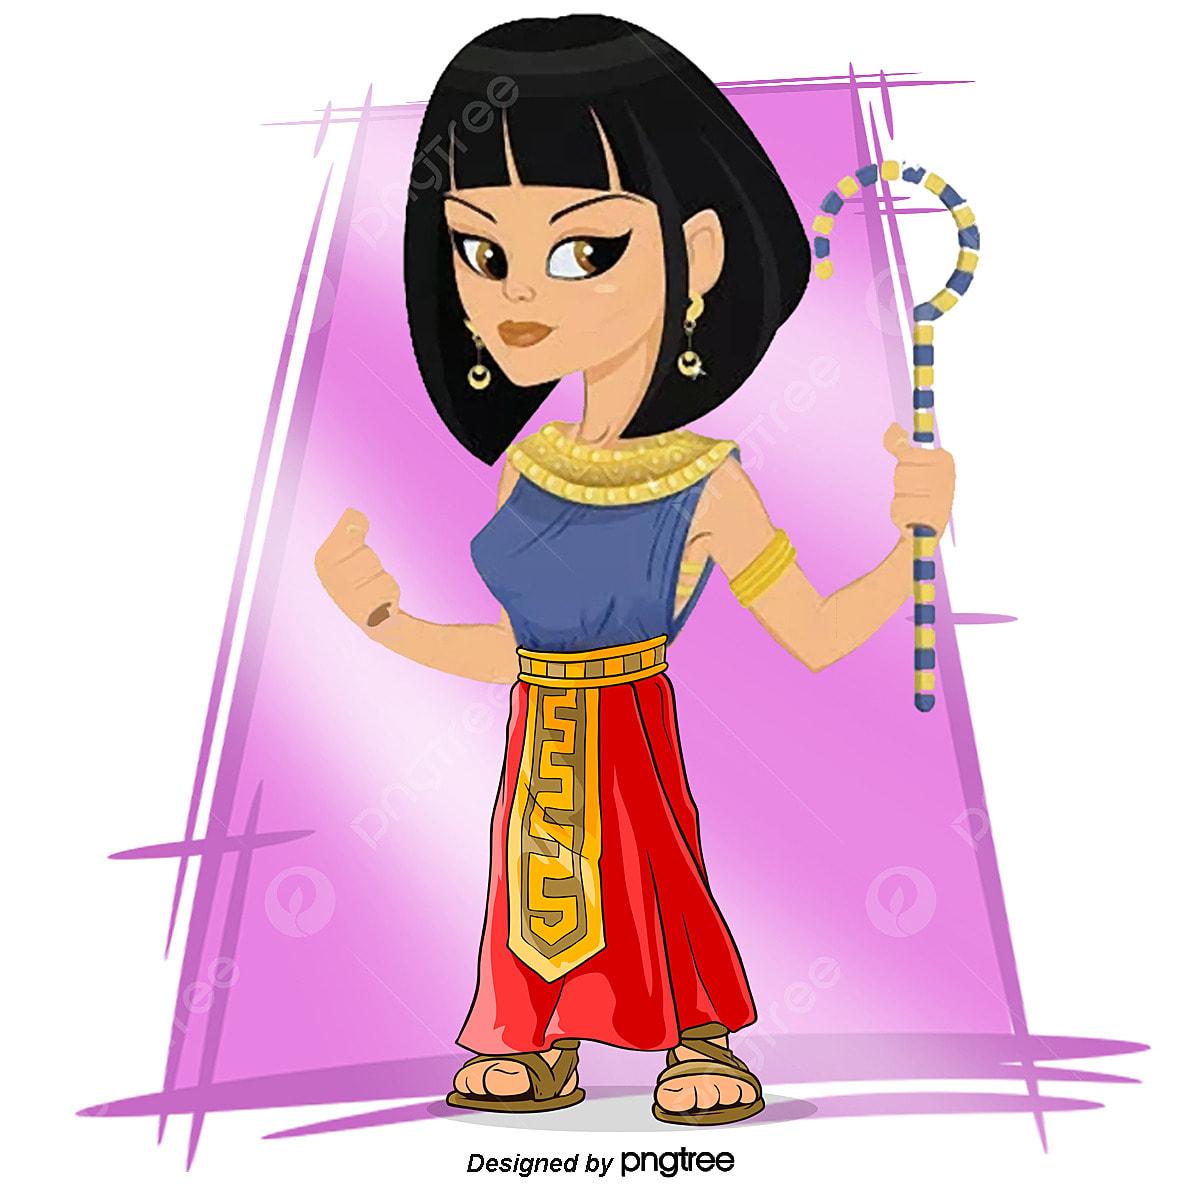 le pharaon d egypte de vecteur le pharaon d egypte pharaon dessin de pharaon png et vecteur pour